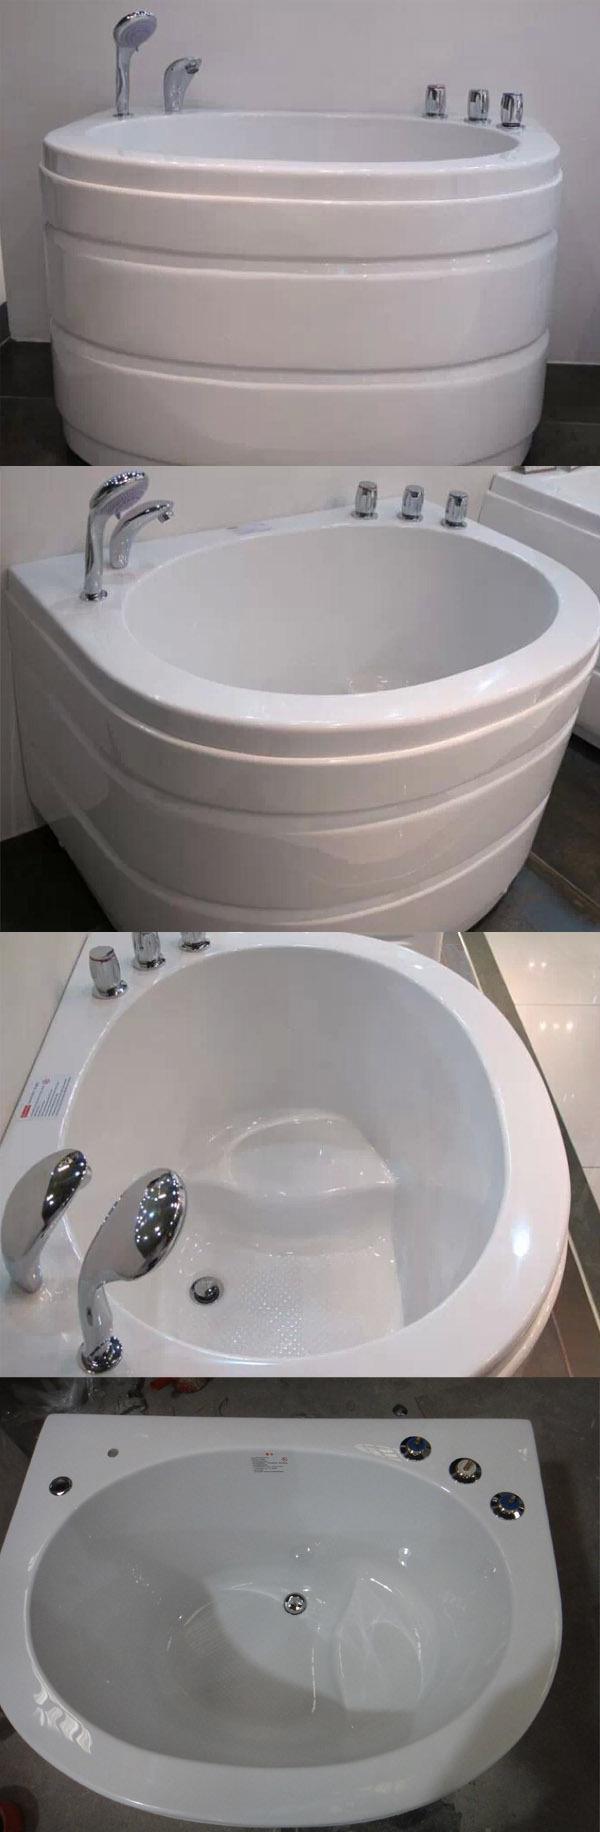 hs b02 whirlpool bathtub for babies 1m bathtub small. Black Bedroom Furniture Sets. Home Design Ideas